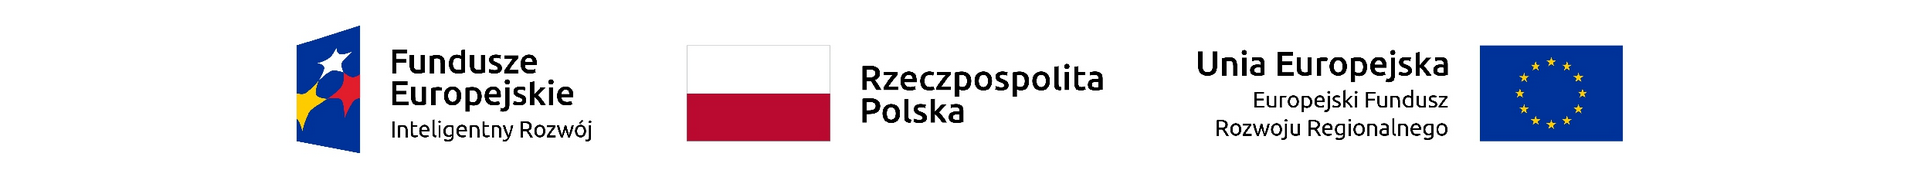 fundusze-2020_homepage